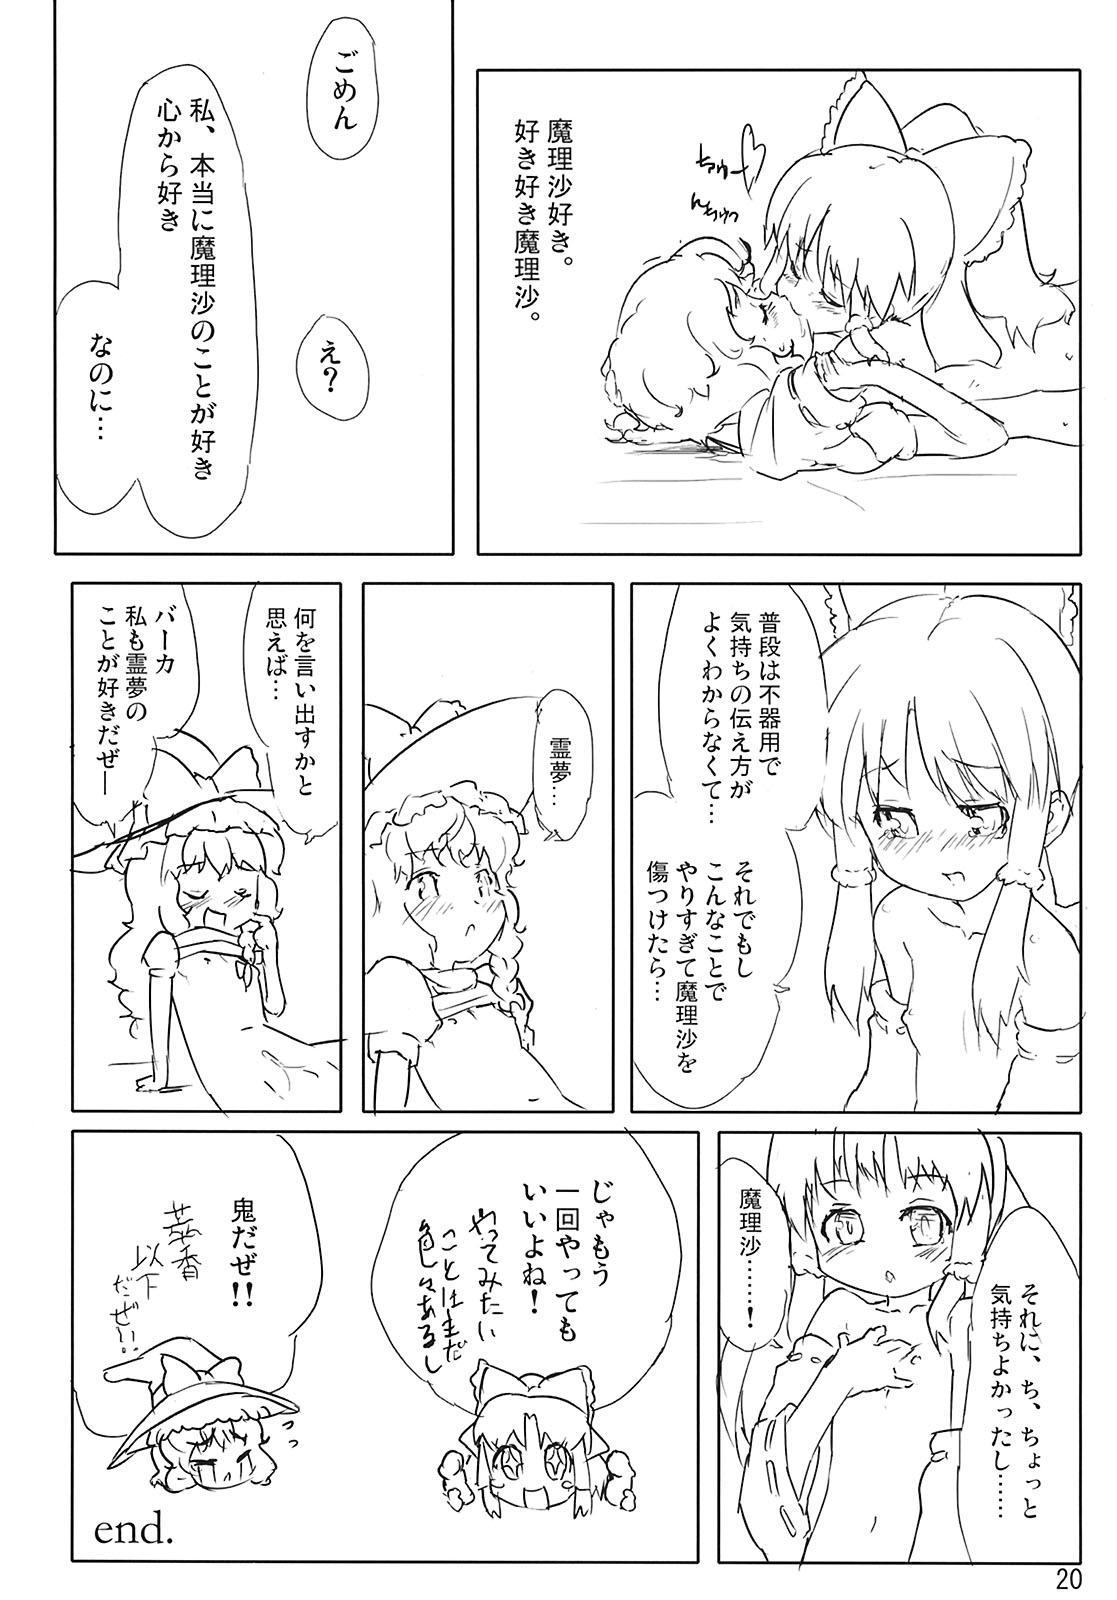 Kirisame Kinoko Jiken - cream of mushroom soup 19